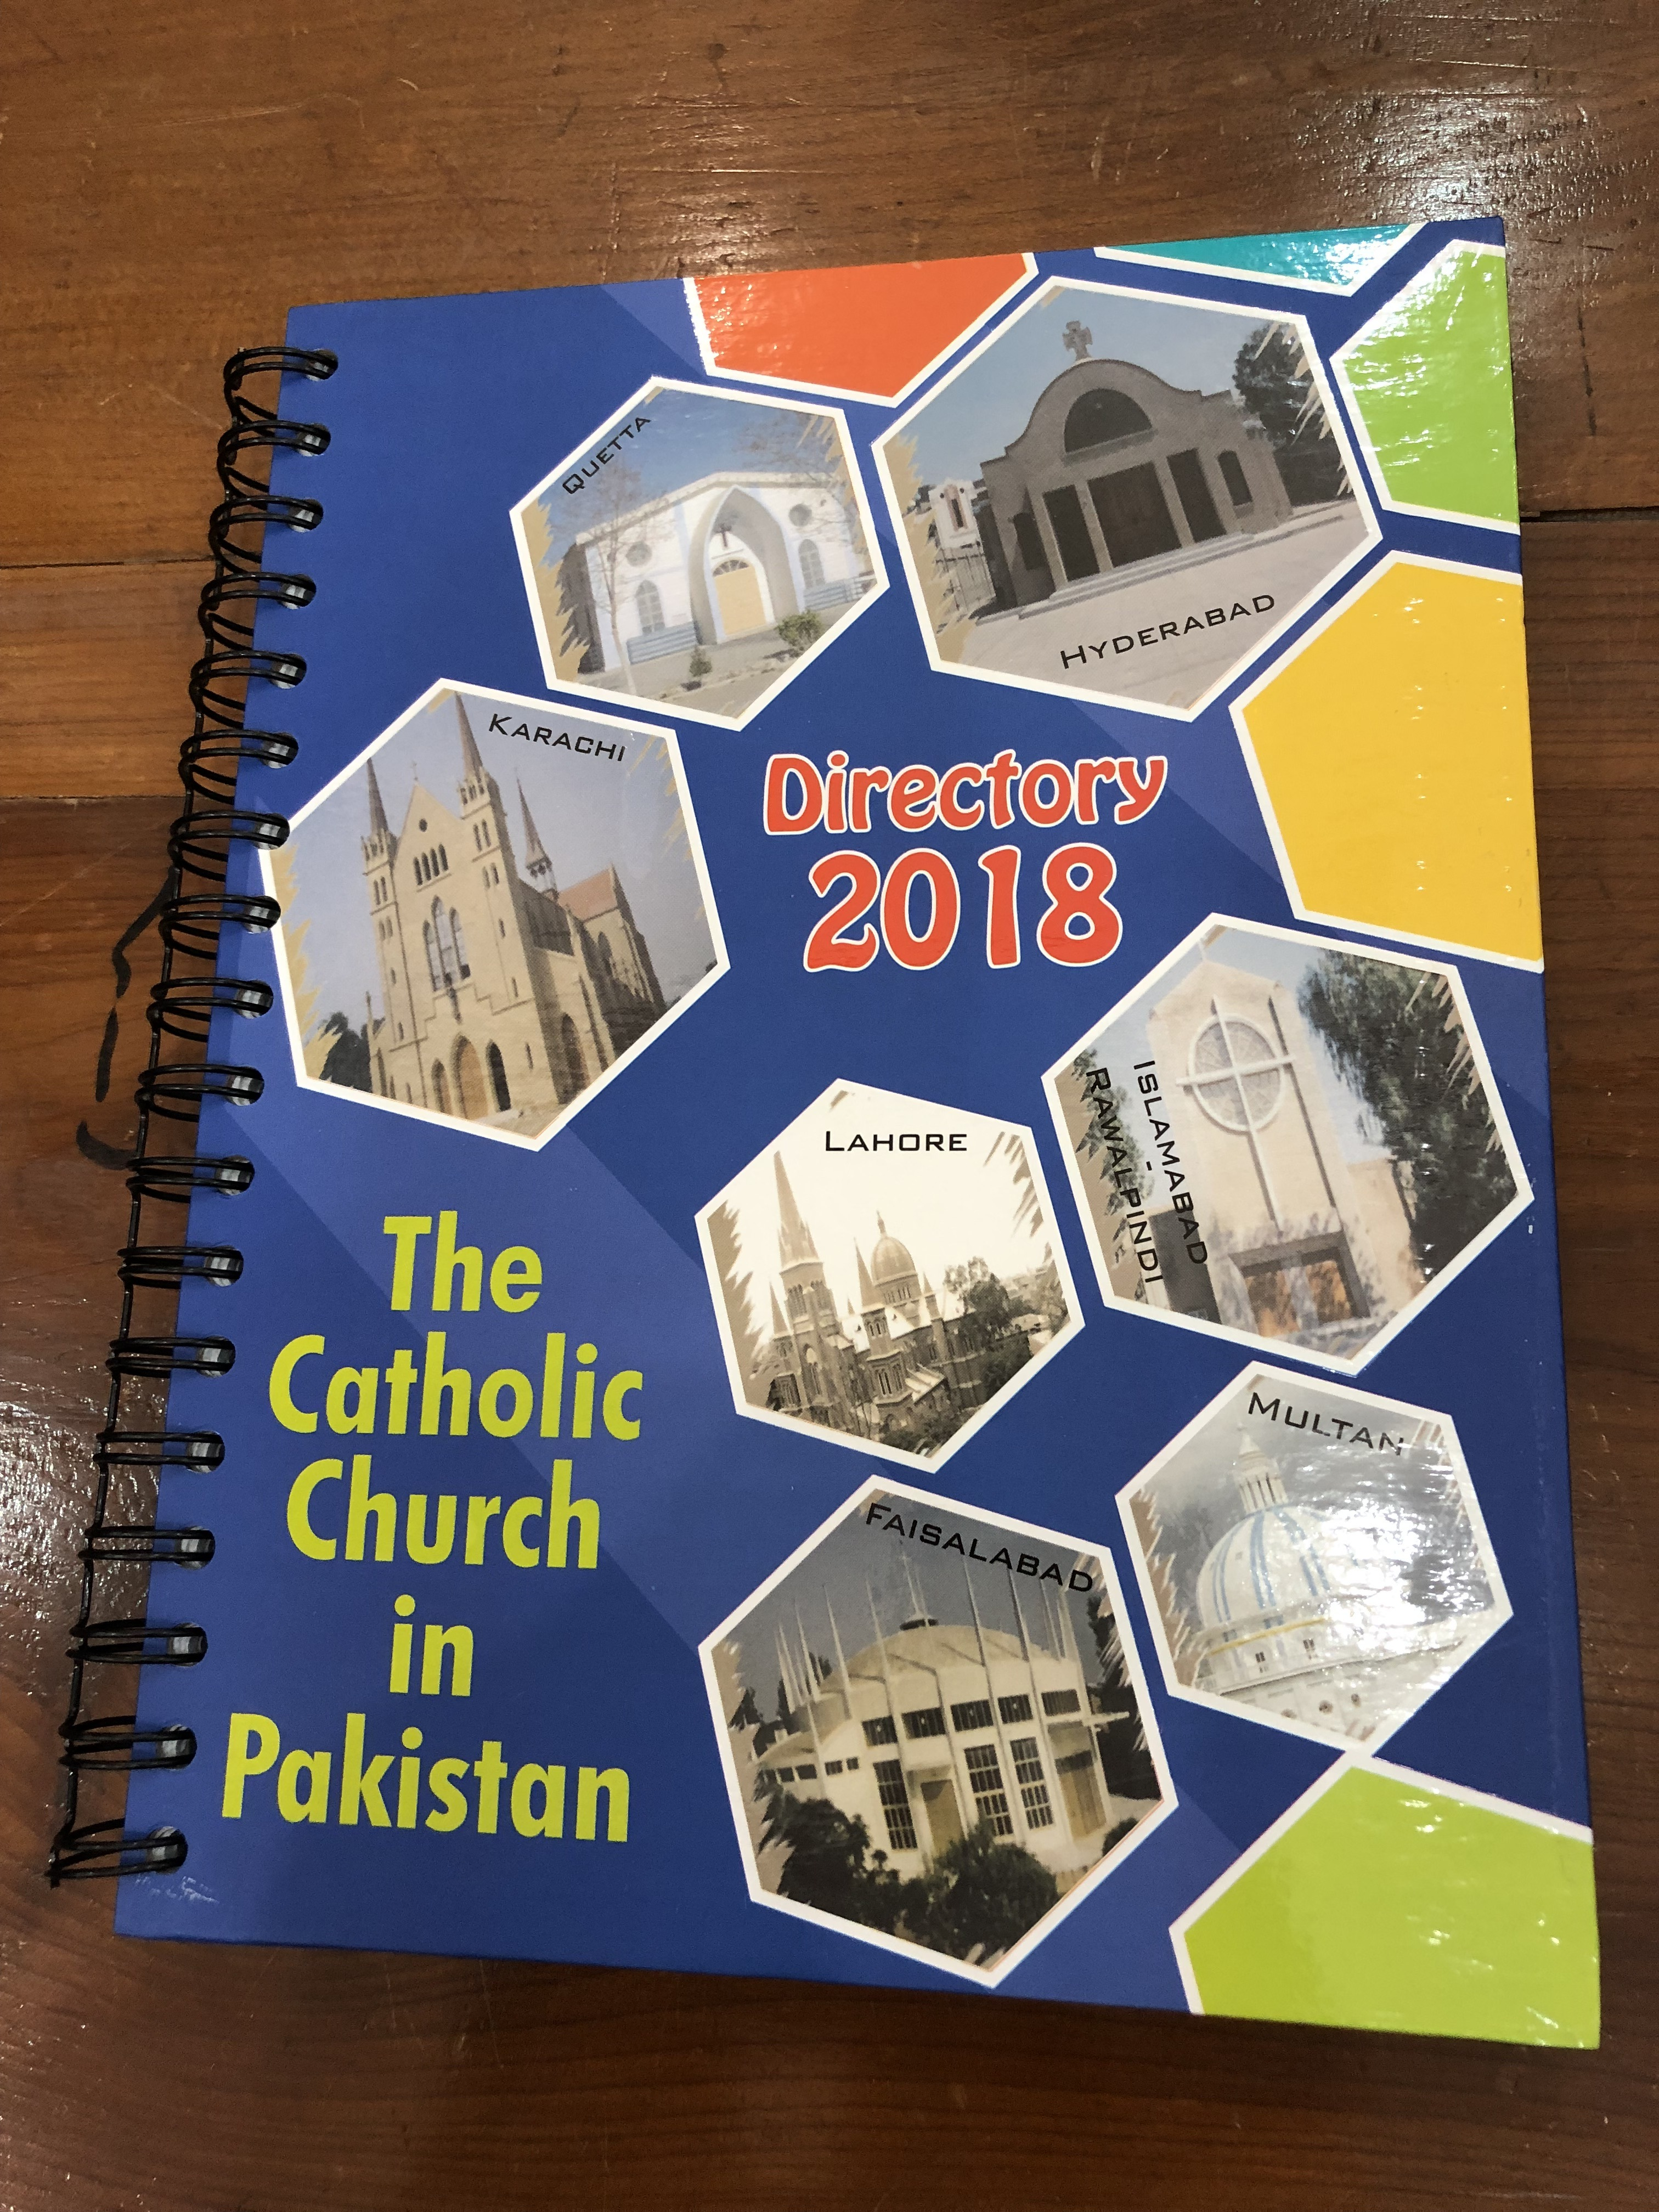 the-catholic-church-in-pakistan-directory-2018-karachi-quetta-hyderabad-lahore-islamabad-faisalabad-multan-catholic-directory-of-pakistan-churches-catholic-bible-commission-pakistan-1-.jpg